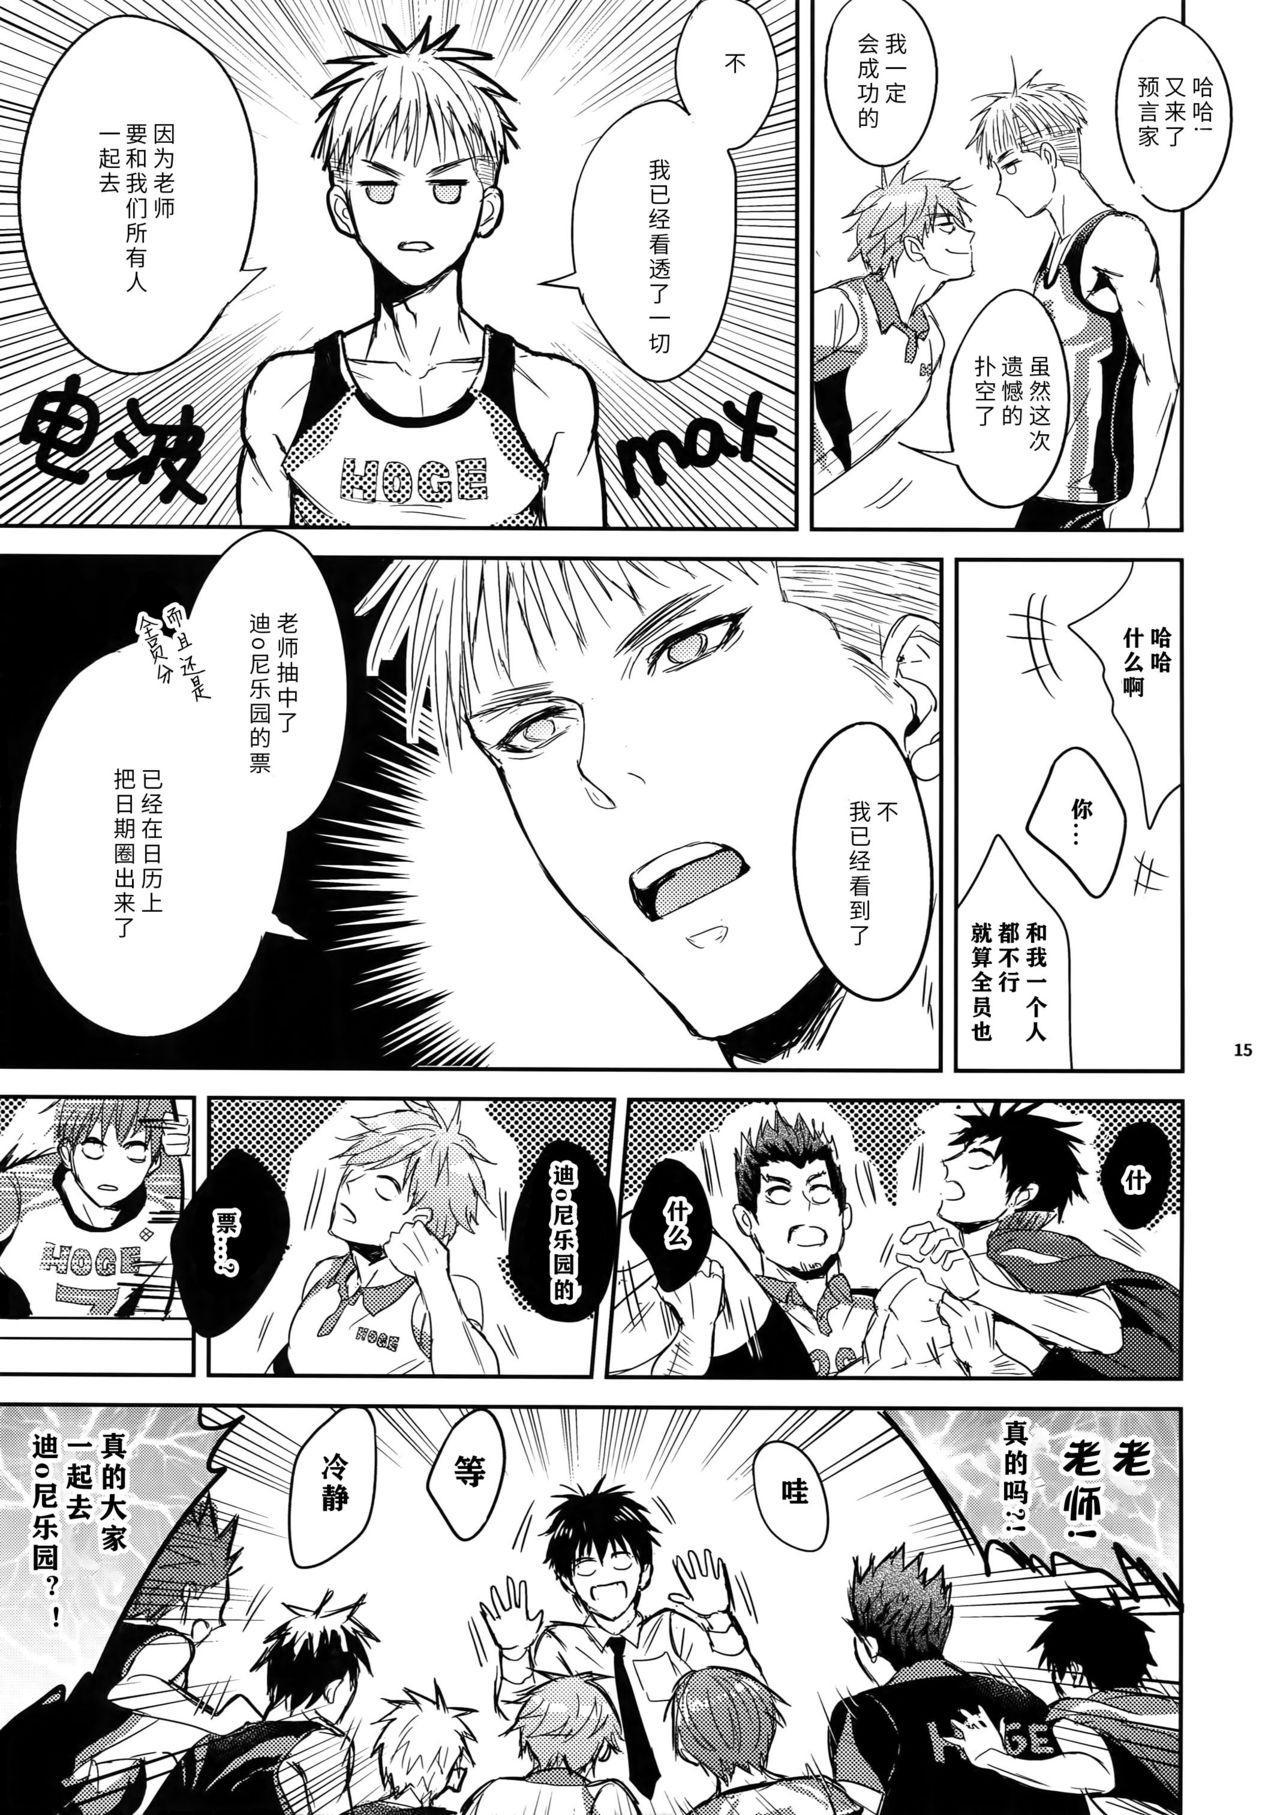 Sensei wa Nekketsu ga Areba Juubunda! | 老师只要热血就够了! 14